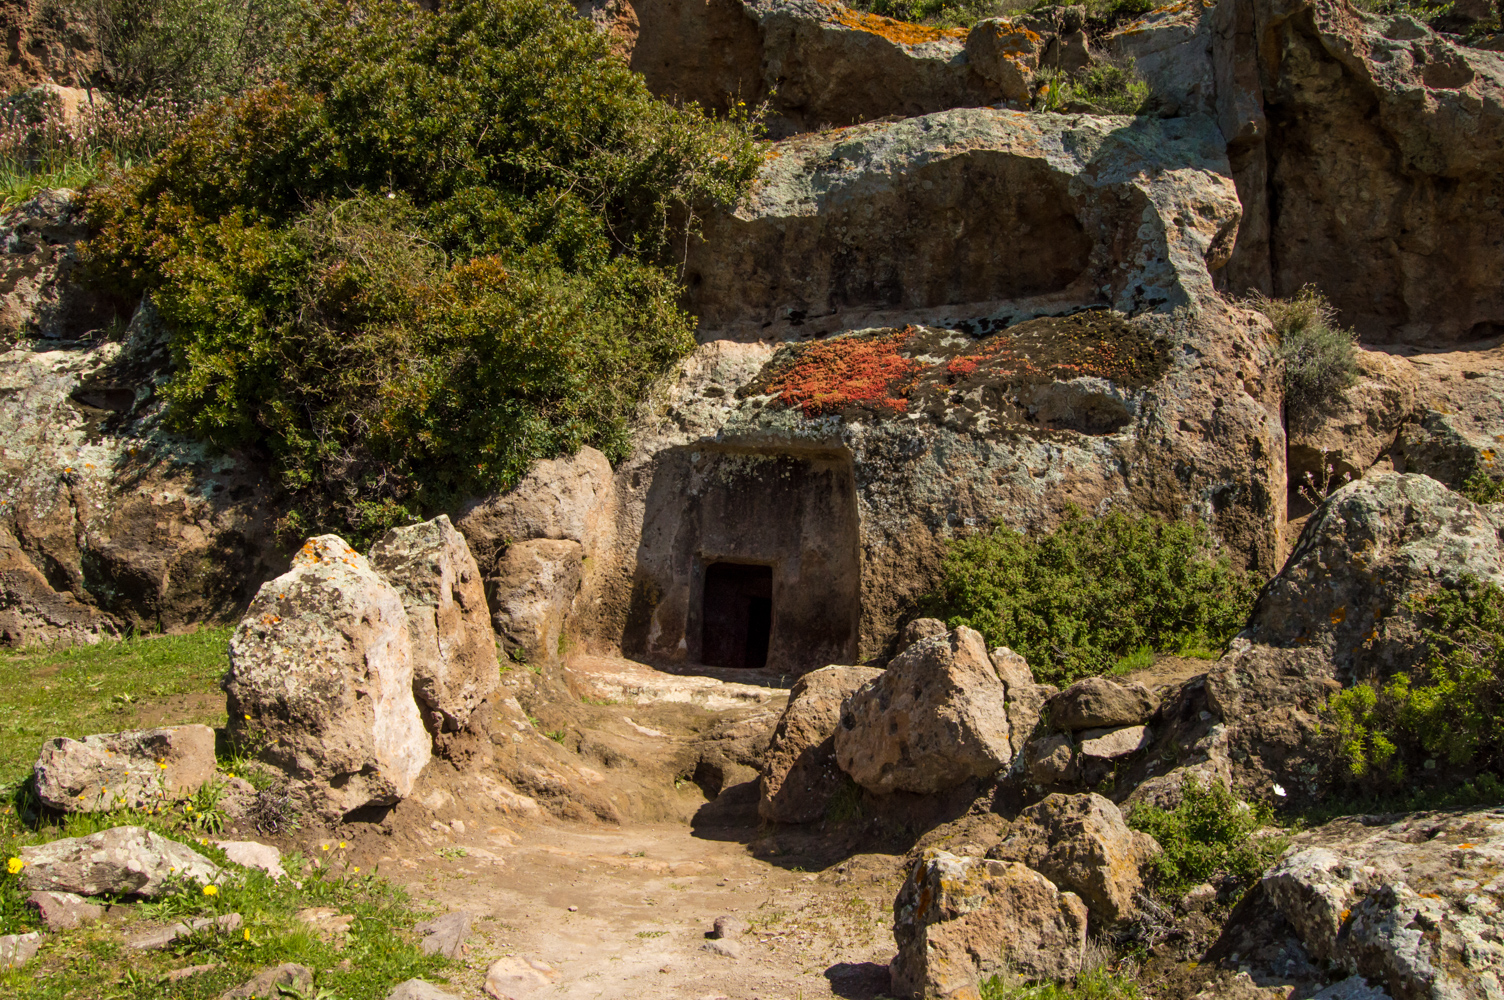 Parco archeologico di Montessu